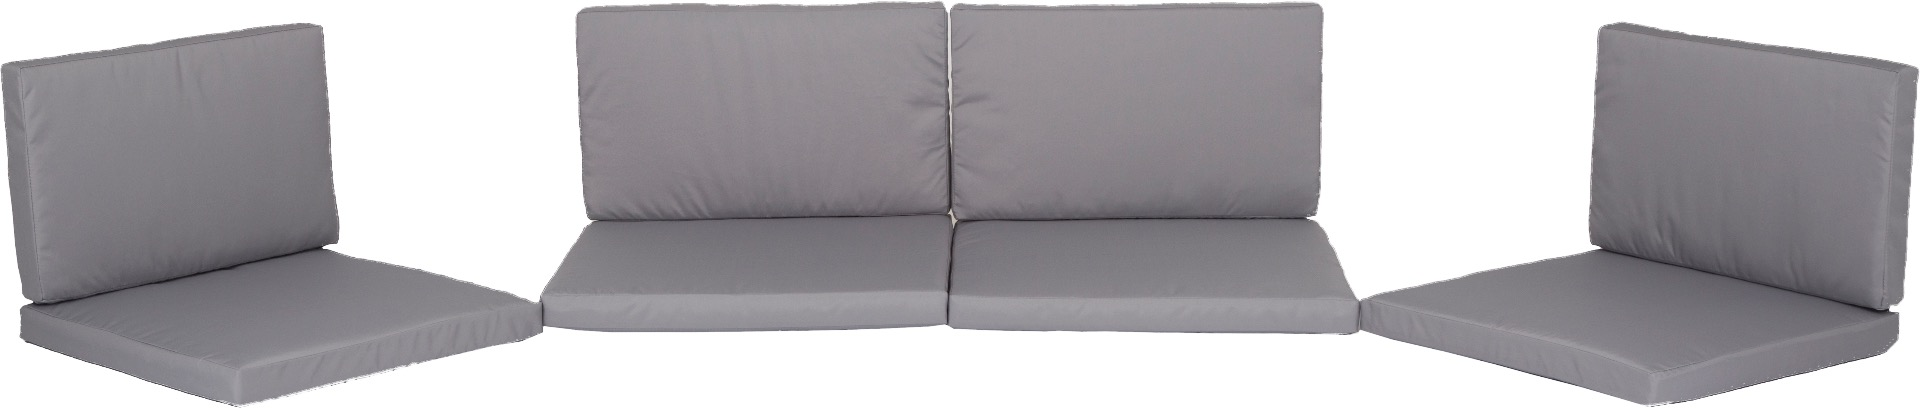 Ersatzkissen Set Lounge Gruppen Monaco in grau 100% Polyester